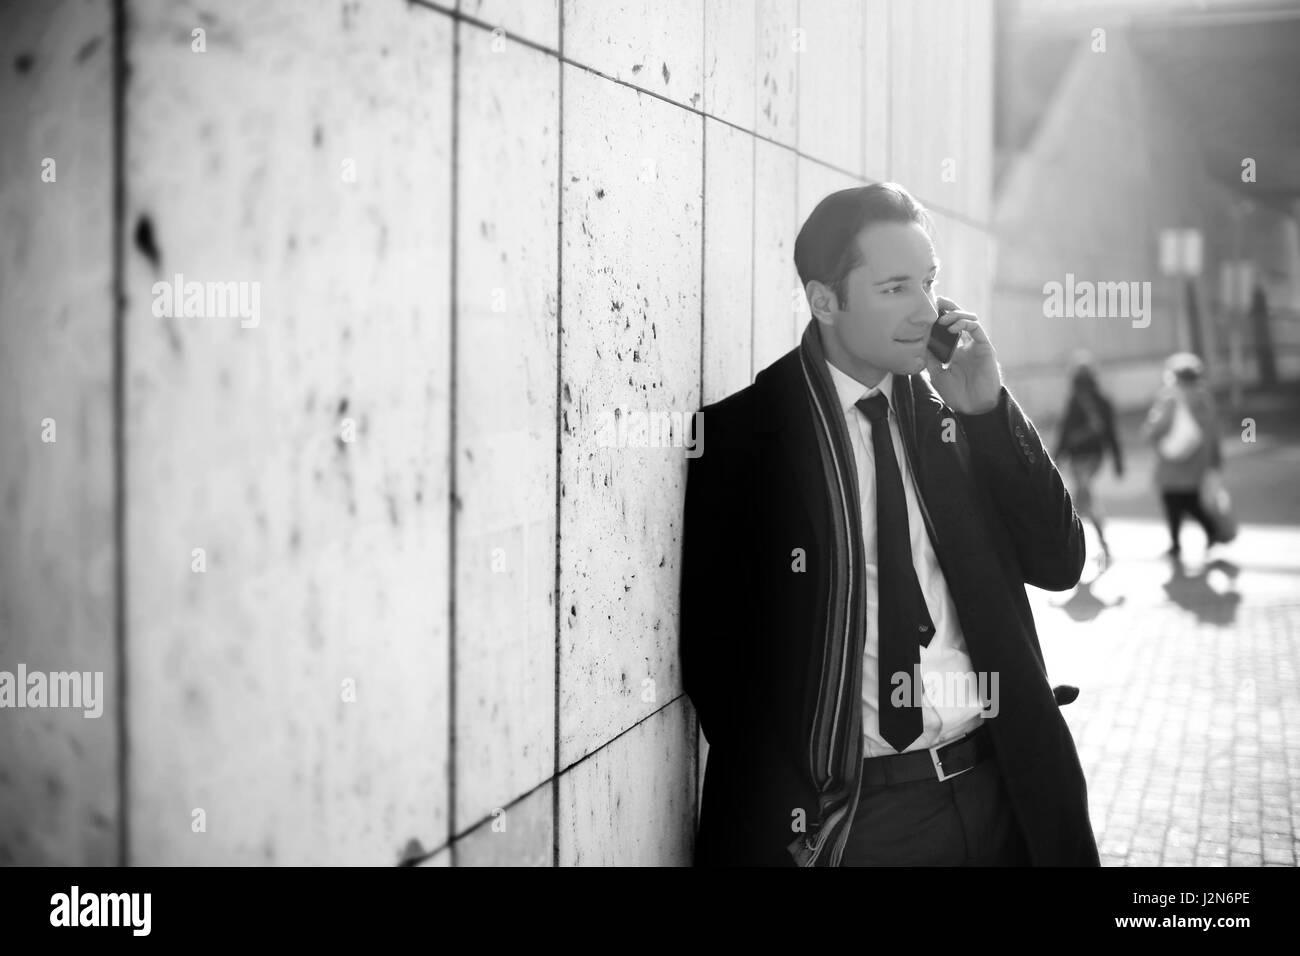 Businessman talking on phone (B&W) - Stock Image